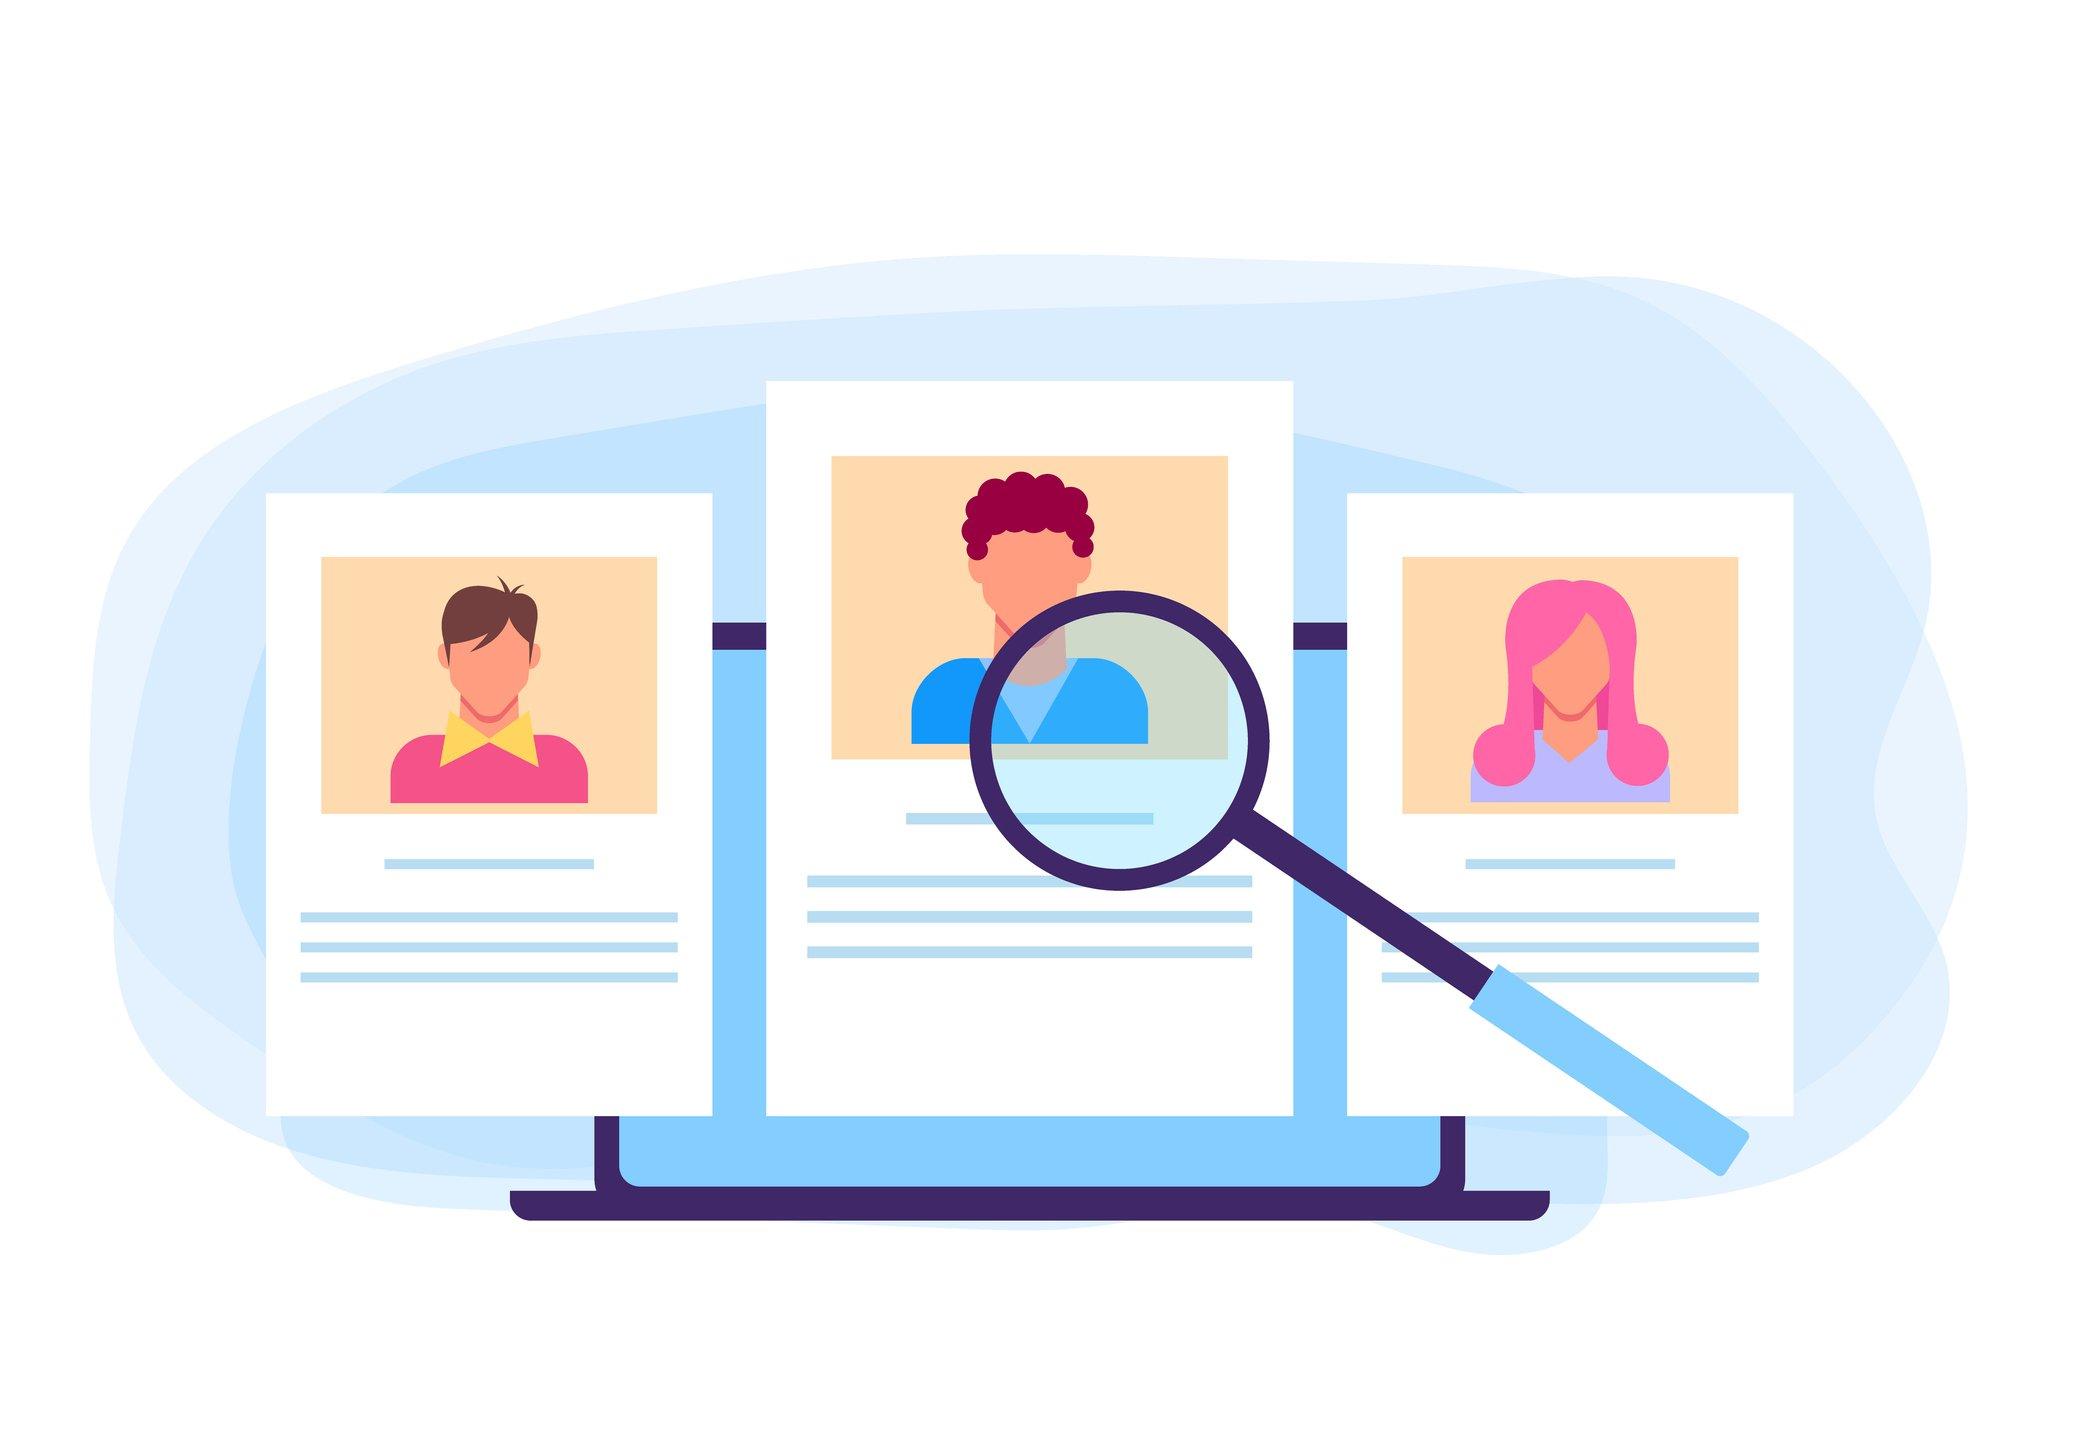 hubspot customer data lead generation concept